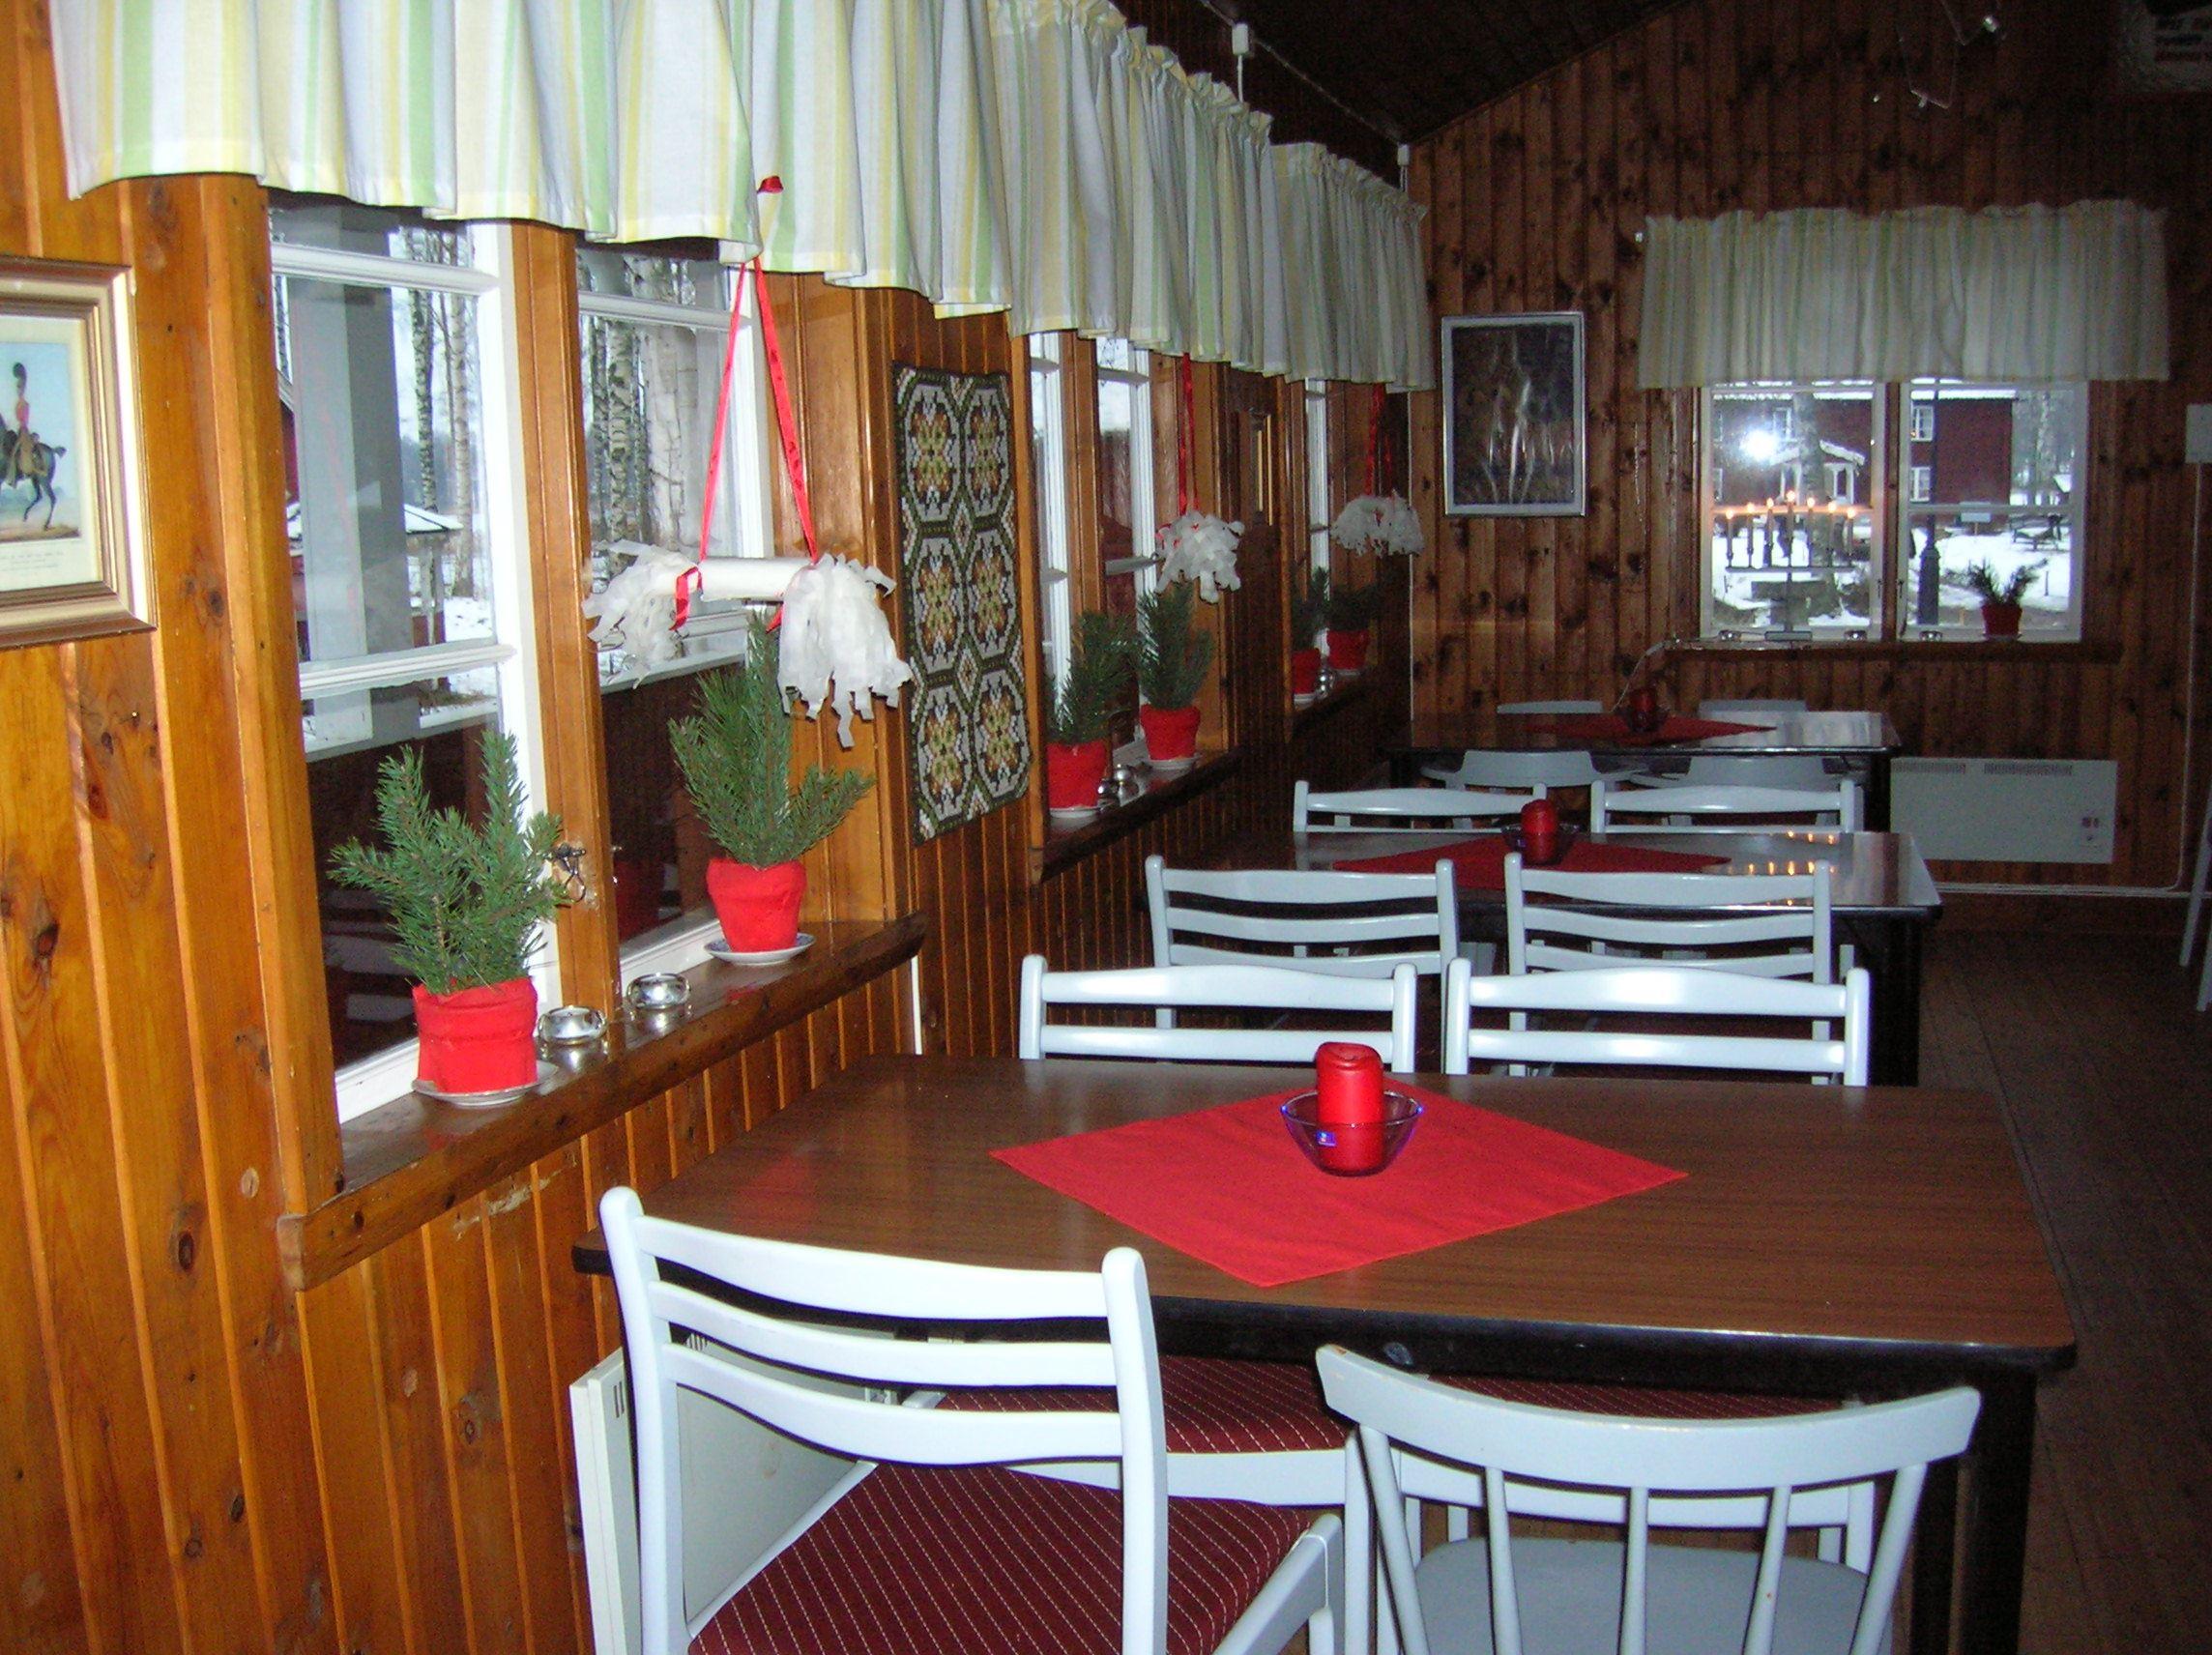 Julkaffe i Hultsfreds hembygdspark